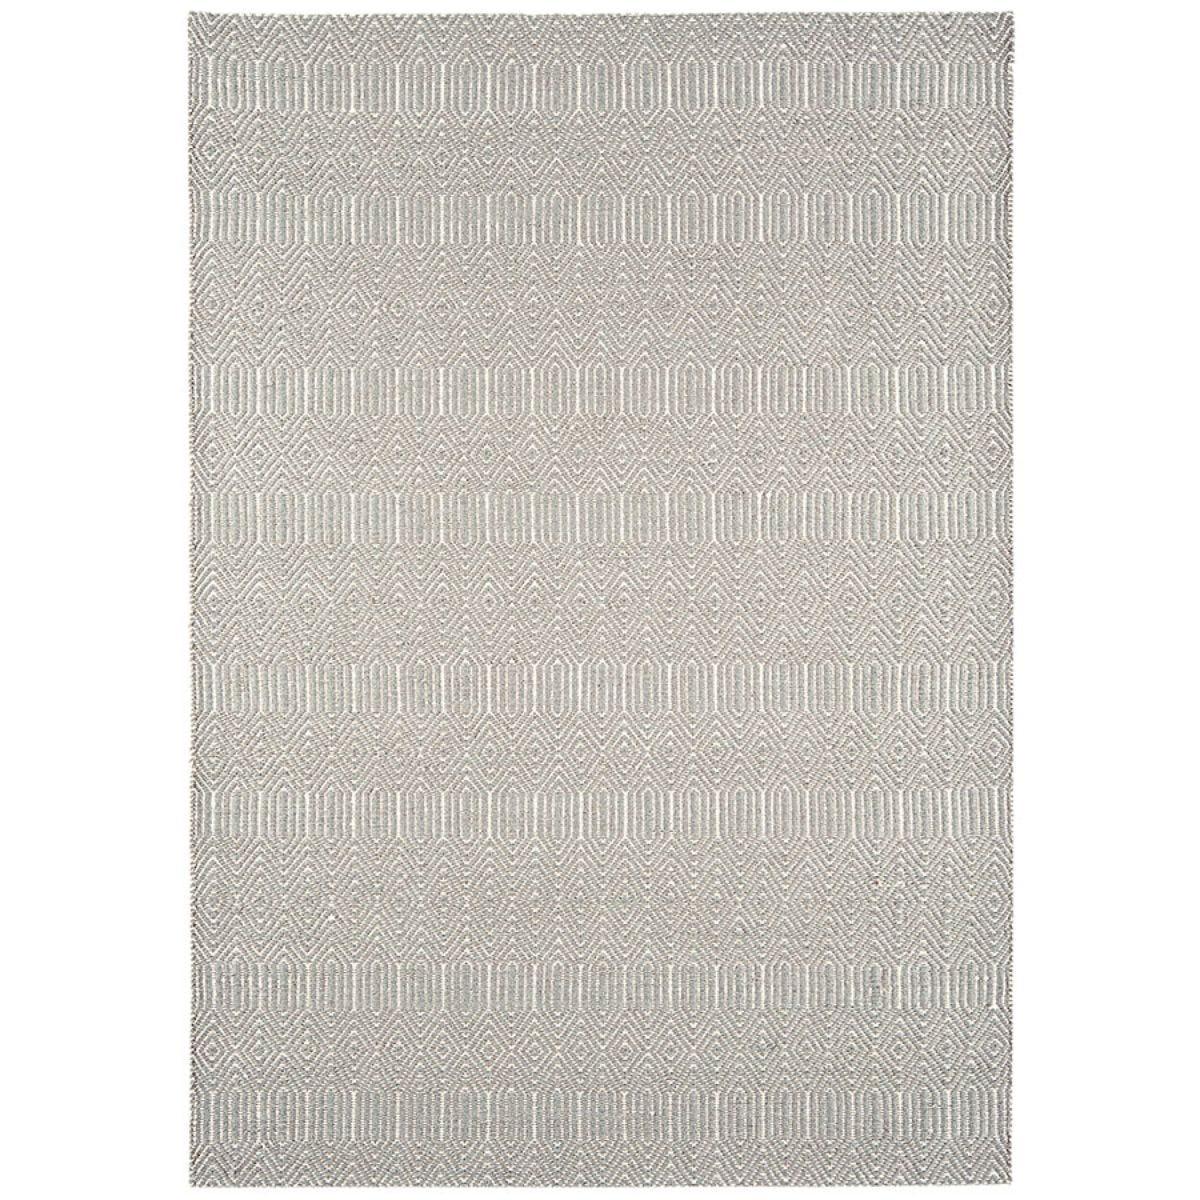 Asiatic Sloan Rug, 200 x 300cm - Silver